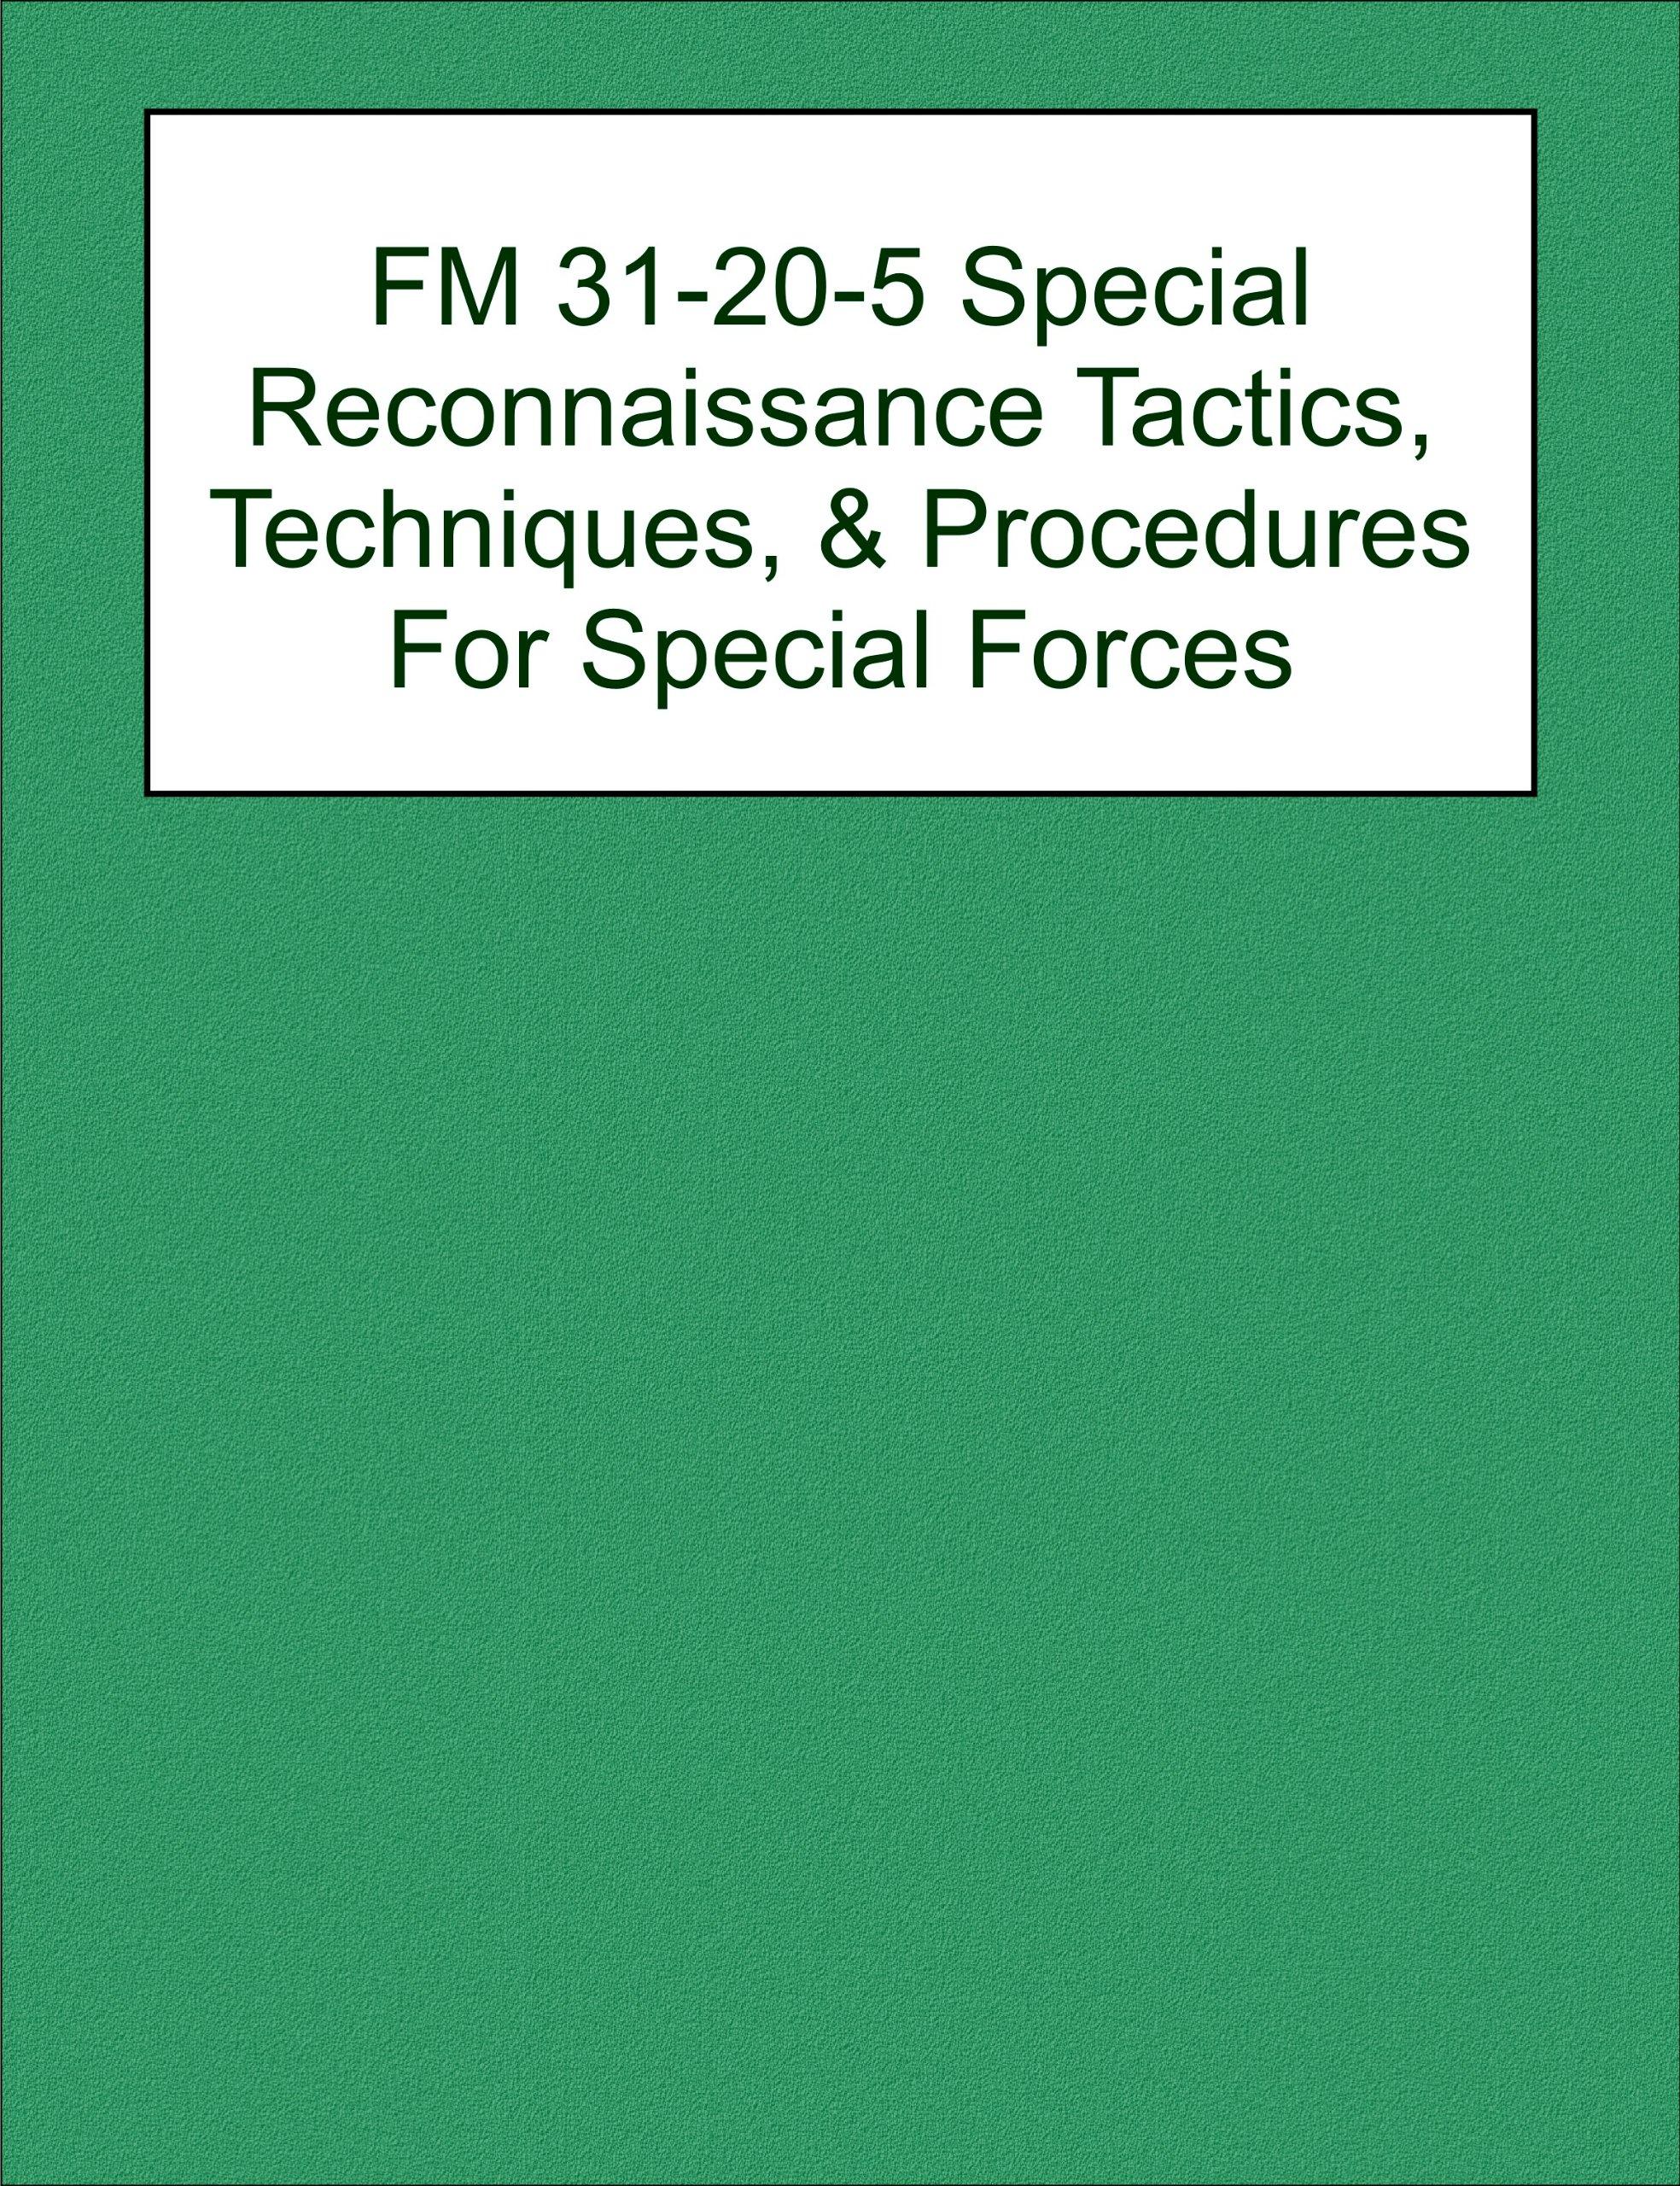 Download FM 31-20-5 Special Reconnaissance Tactics, Techniques, & Procedures For Special Forces ebook